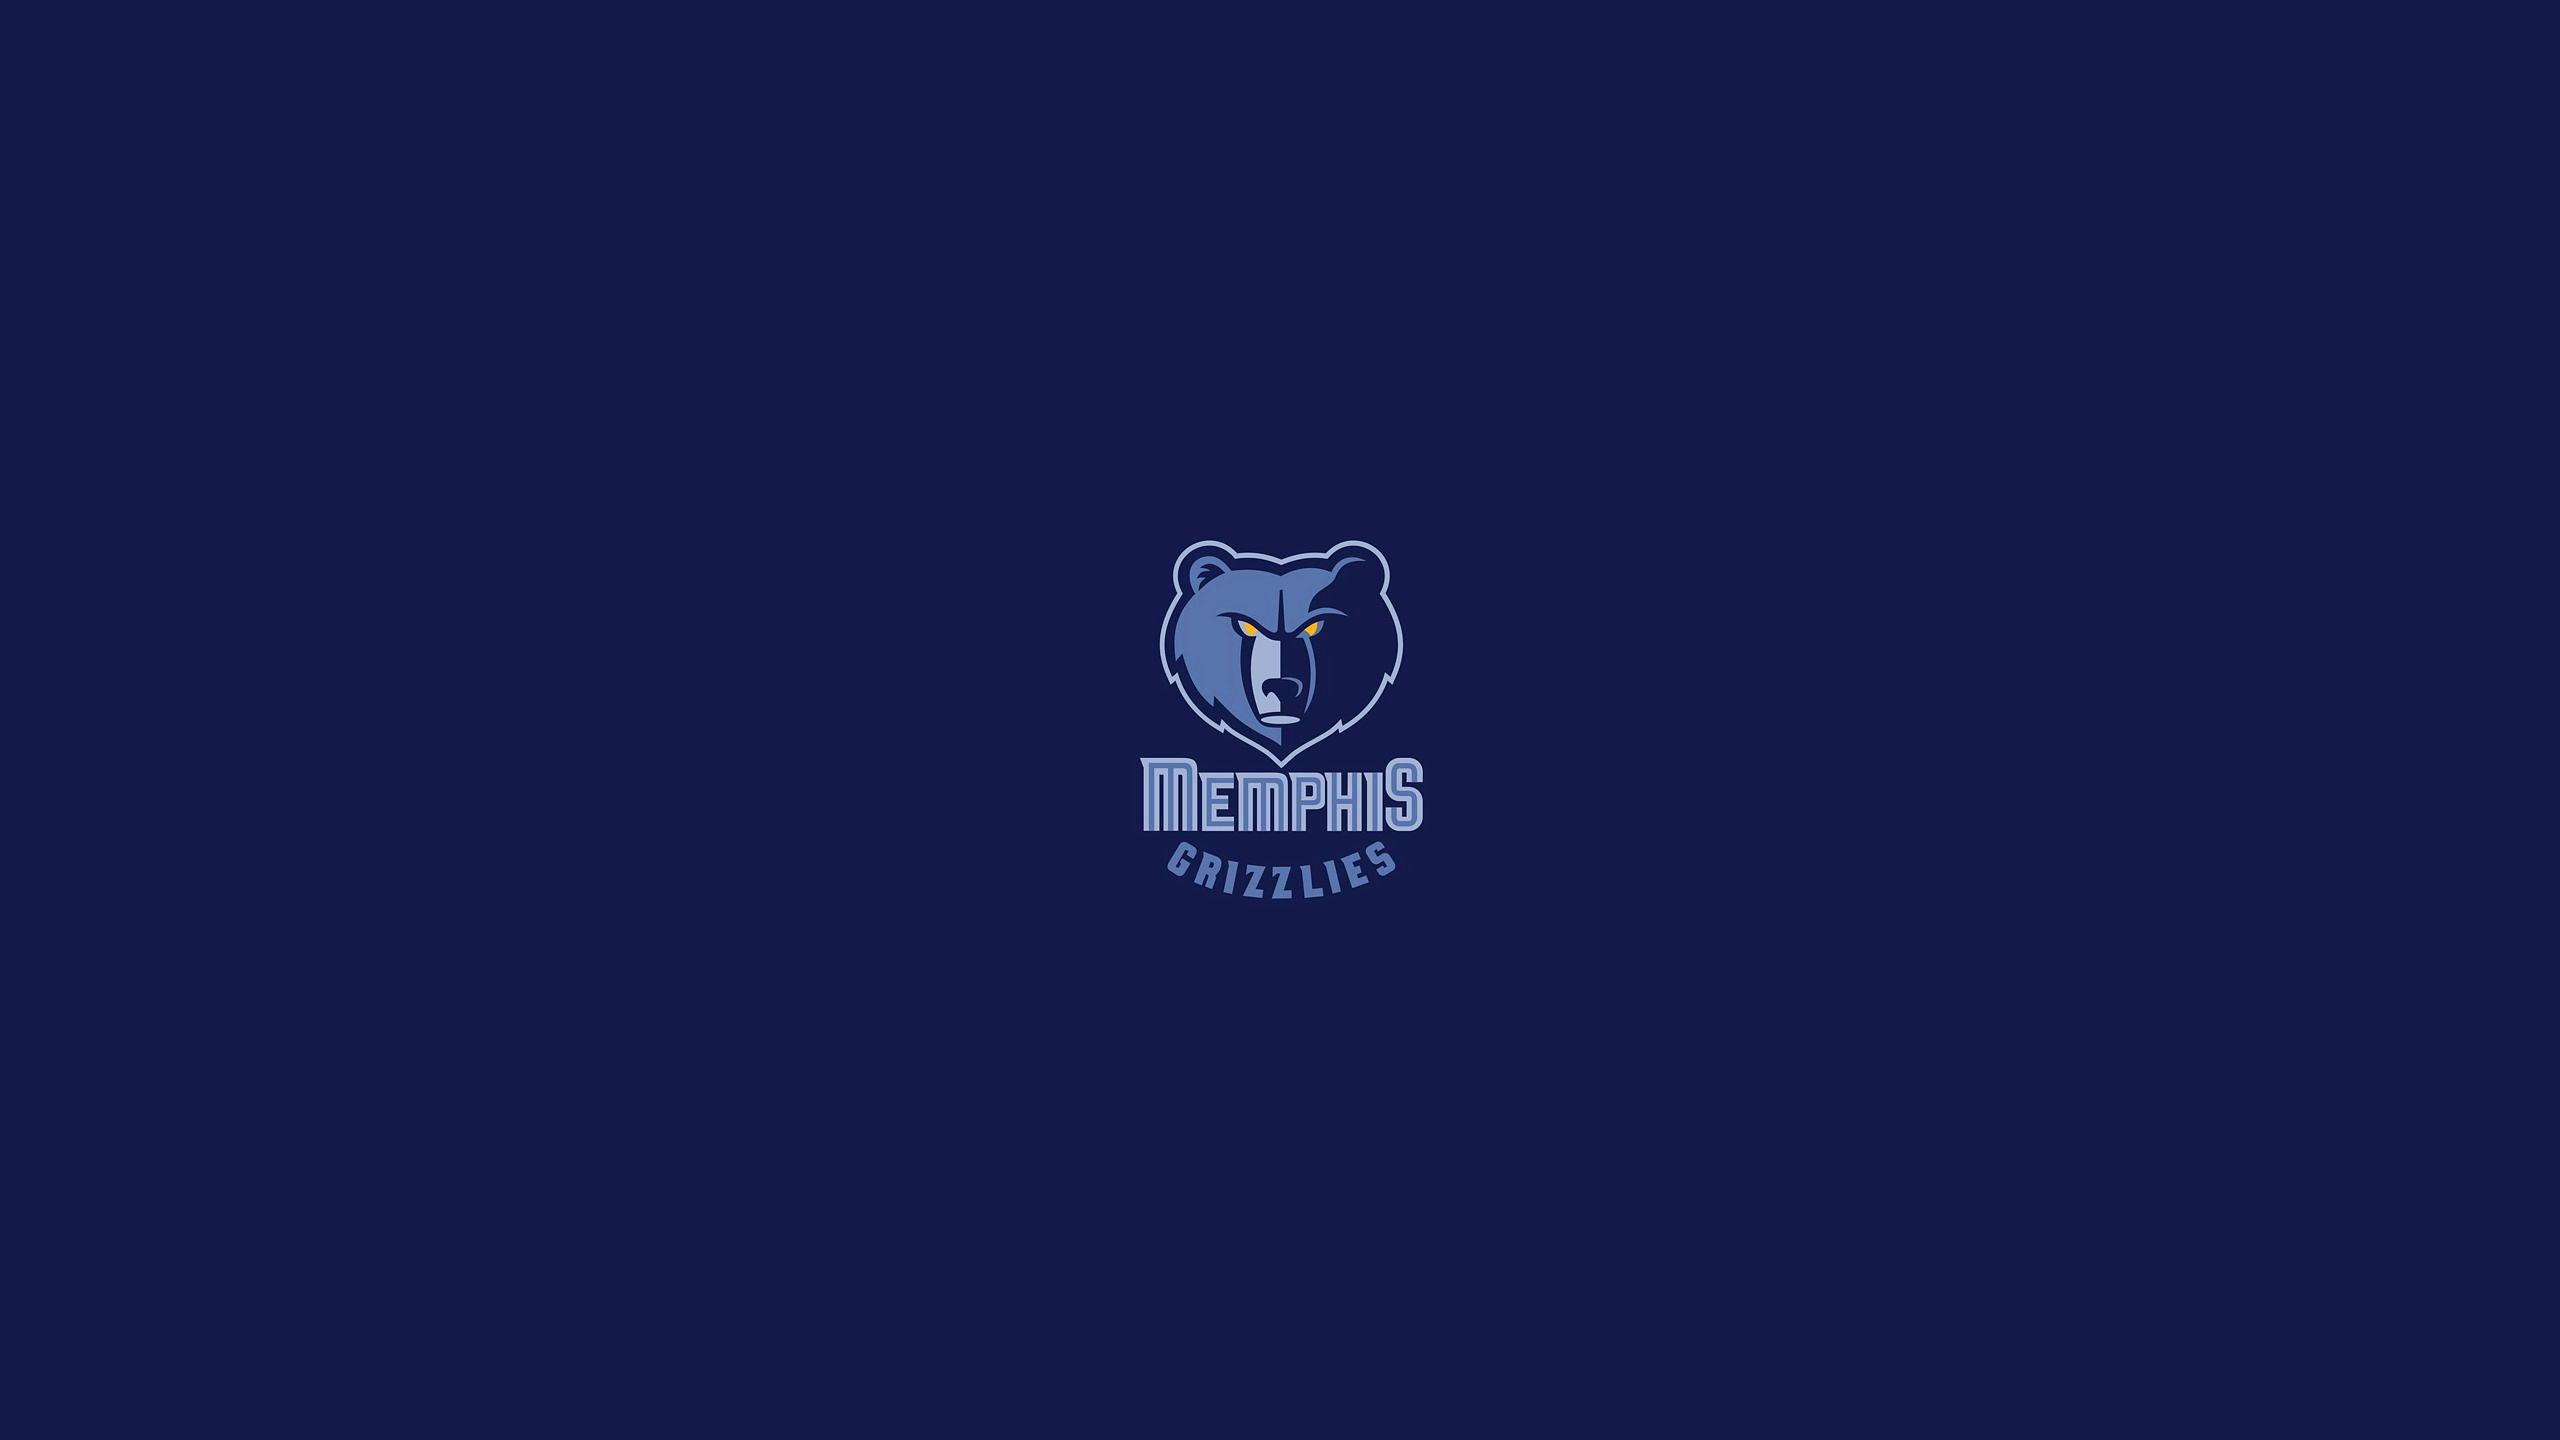 Free Memphis Grizzlies Wallpaper 18122 1024x768 px